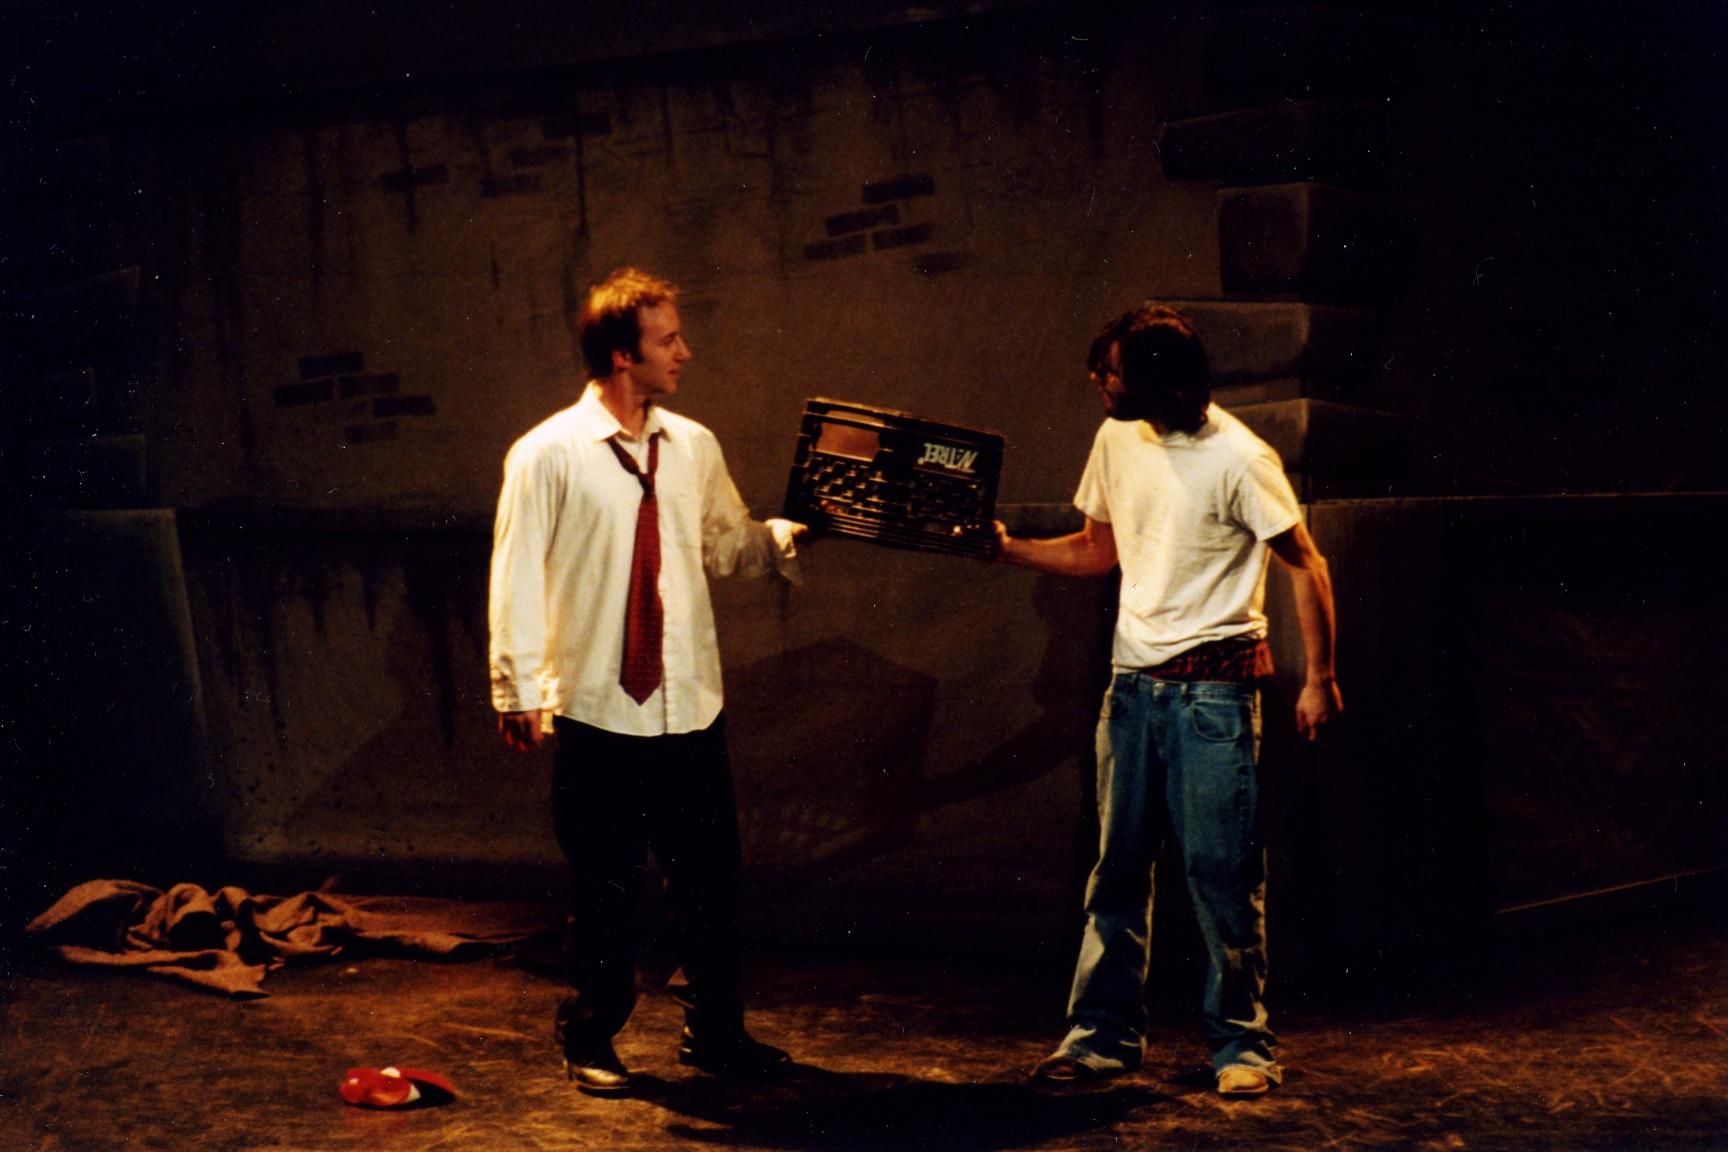 Robert Kingston and Tim Gentle. Photo by Patrick Beagan.